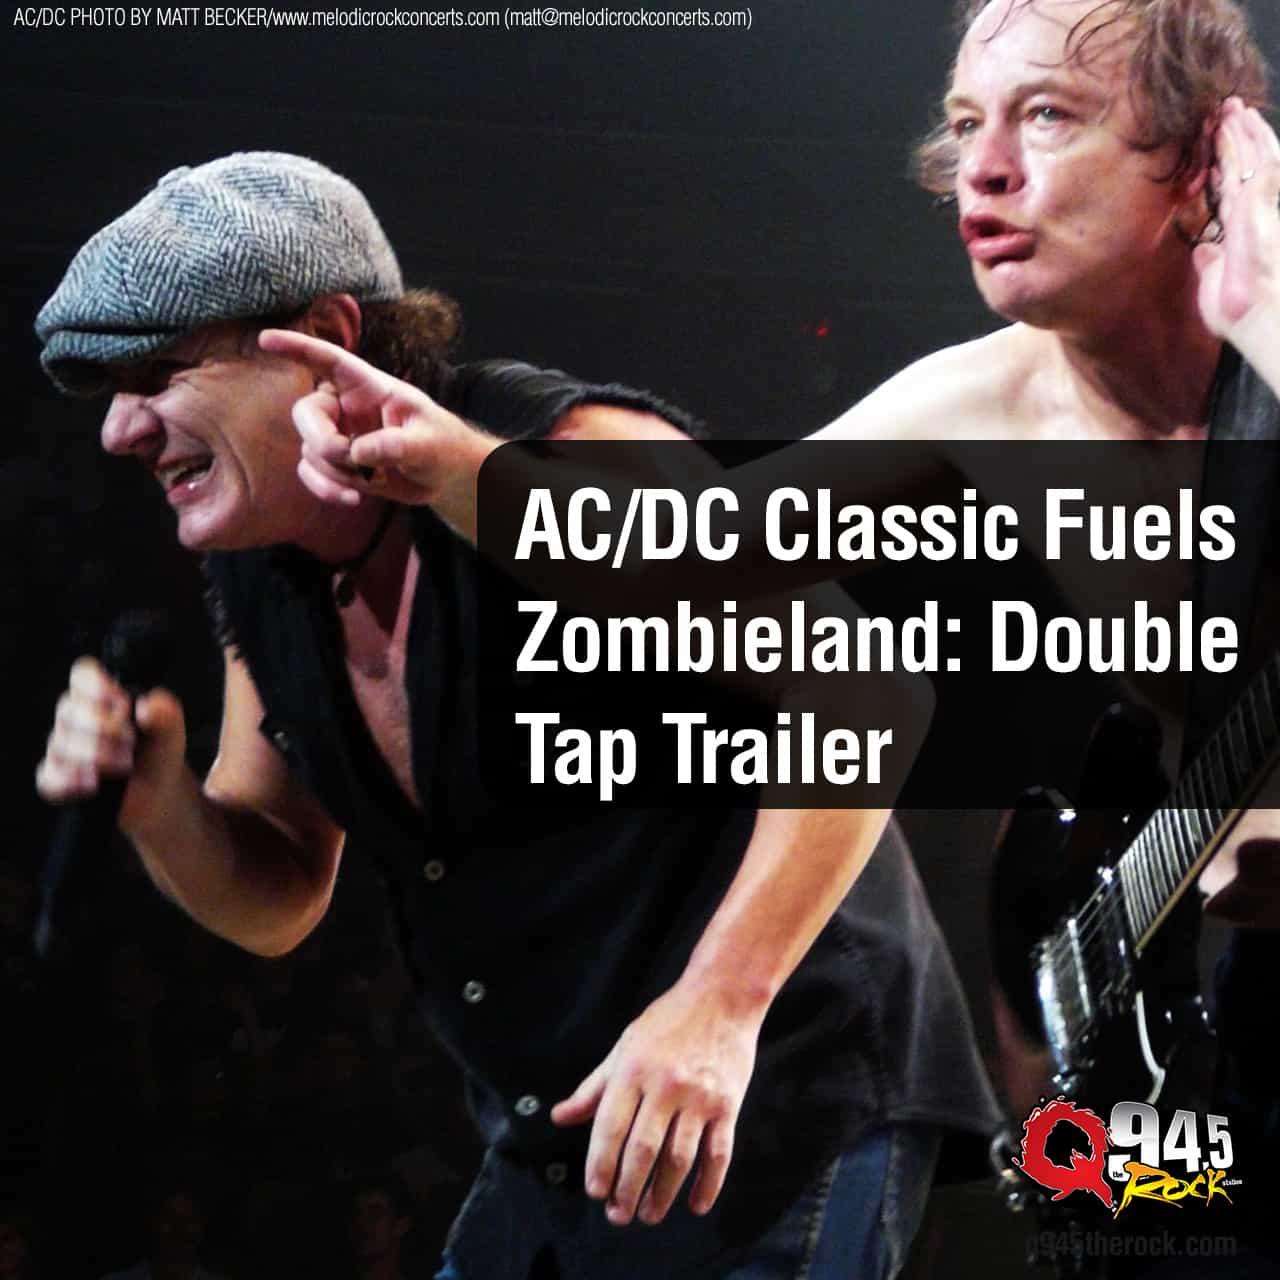 AC/DC Classic Fuels Zombieland: Double Tap Trailer